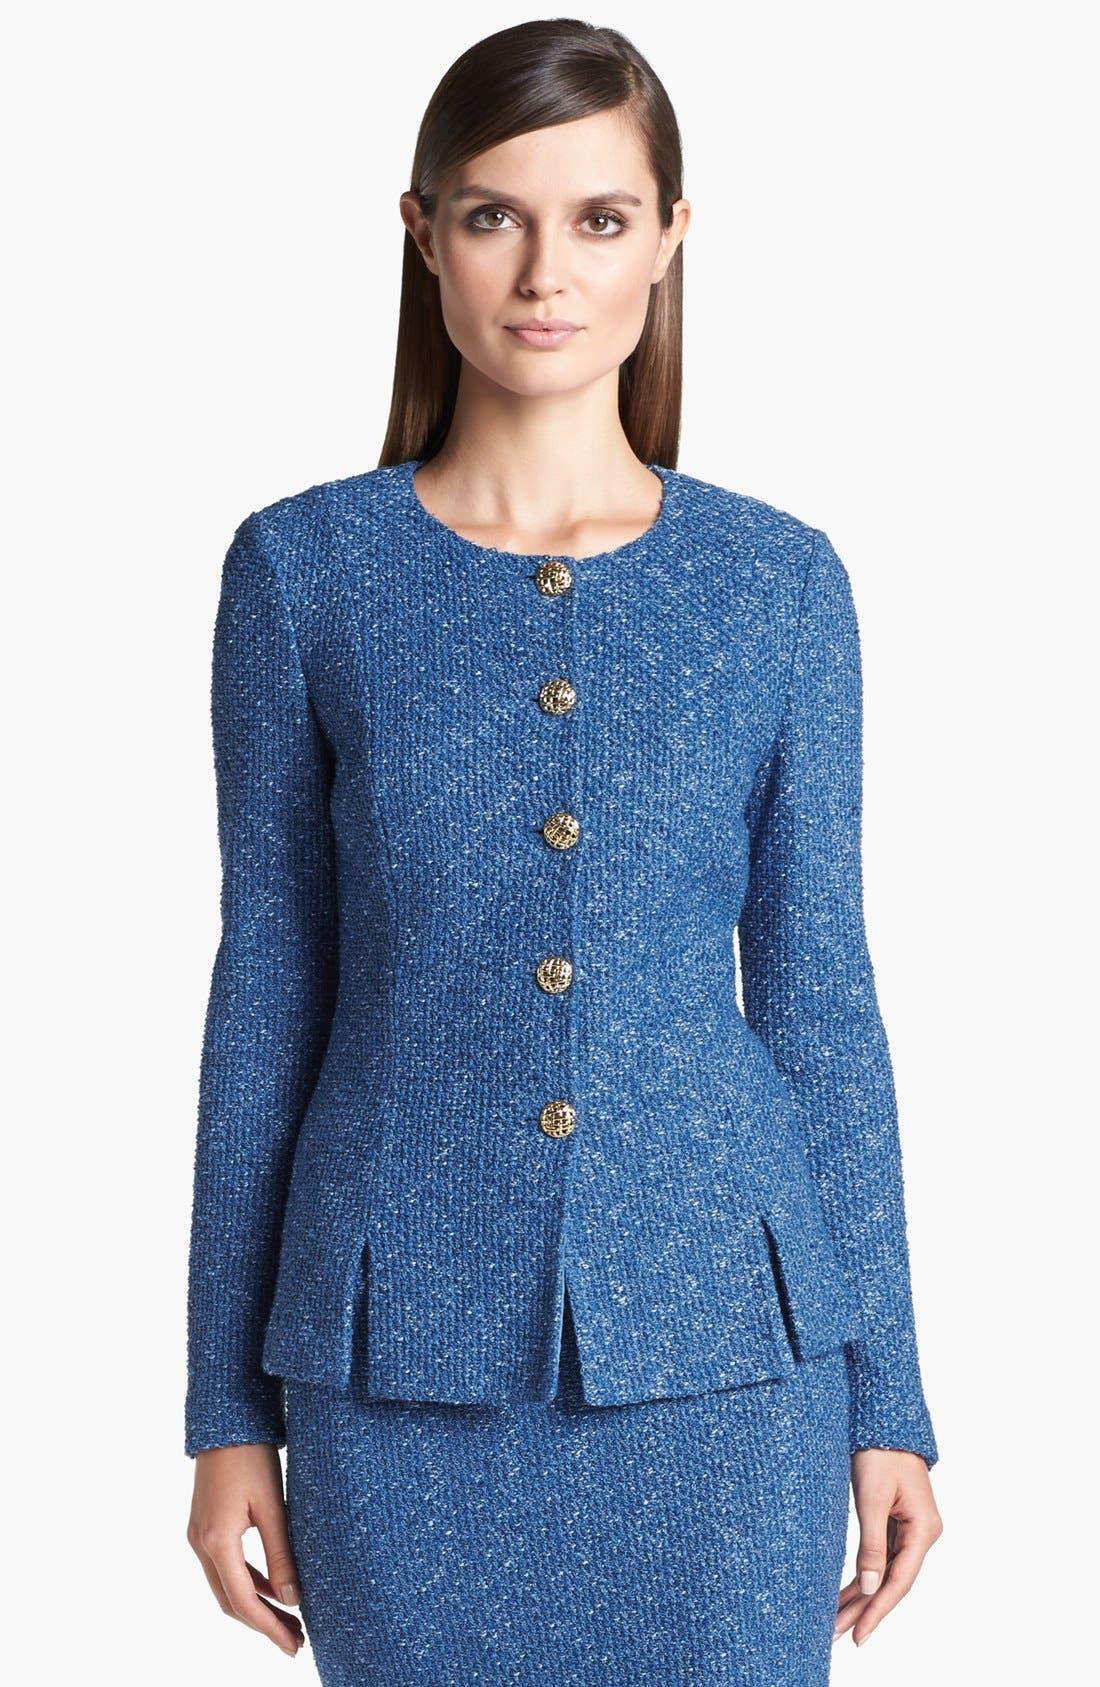 Alternate Image 1 Selected - St. John Collection Flecked Tweed Jacket